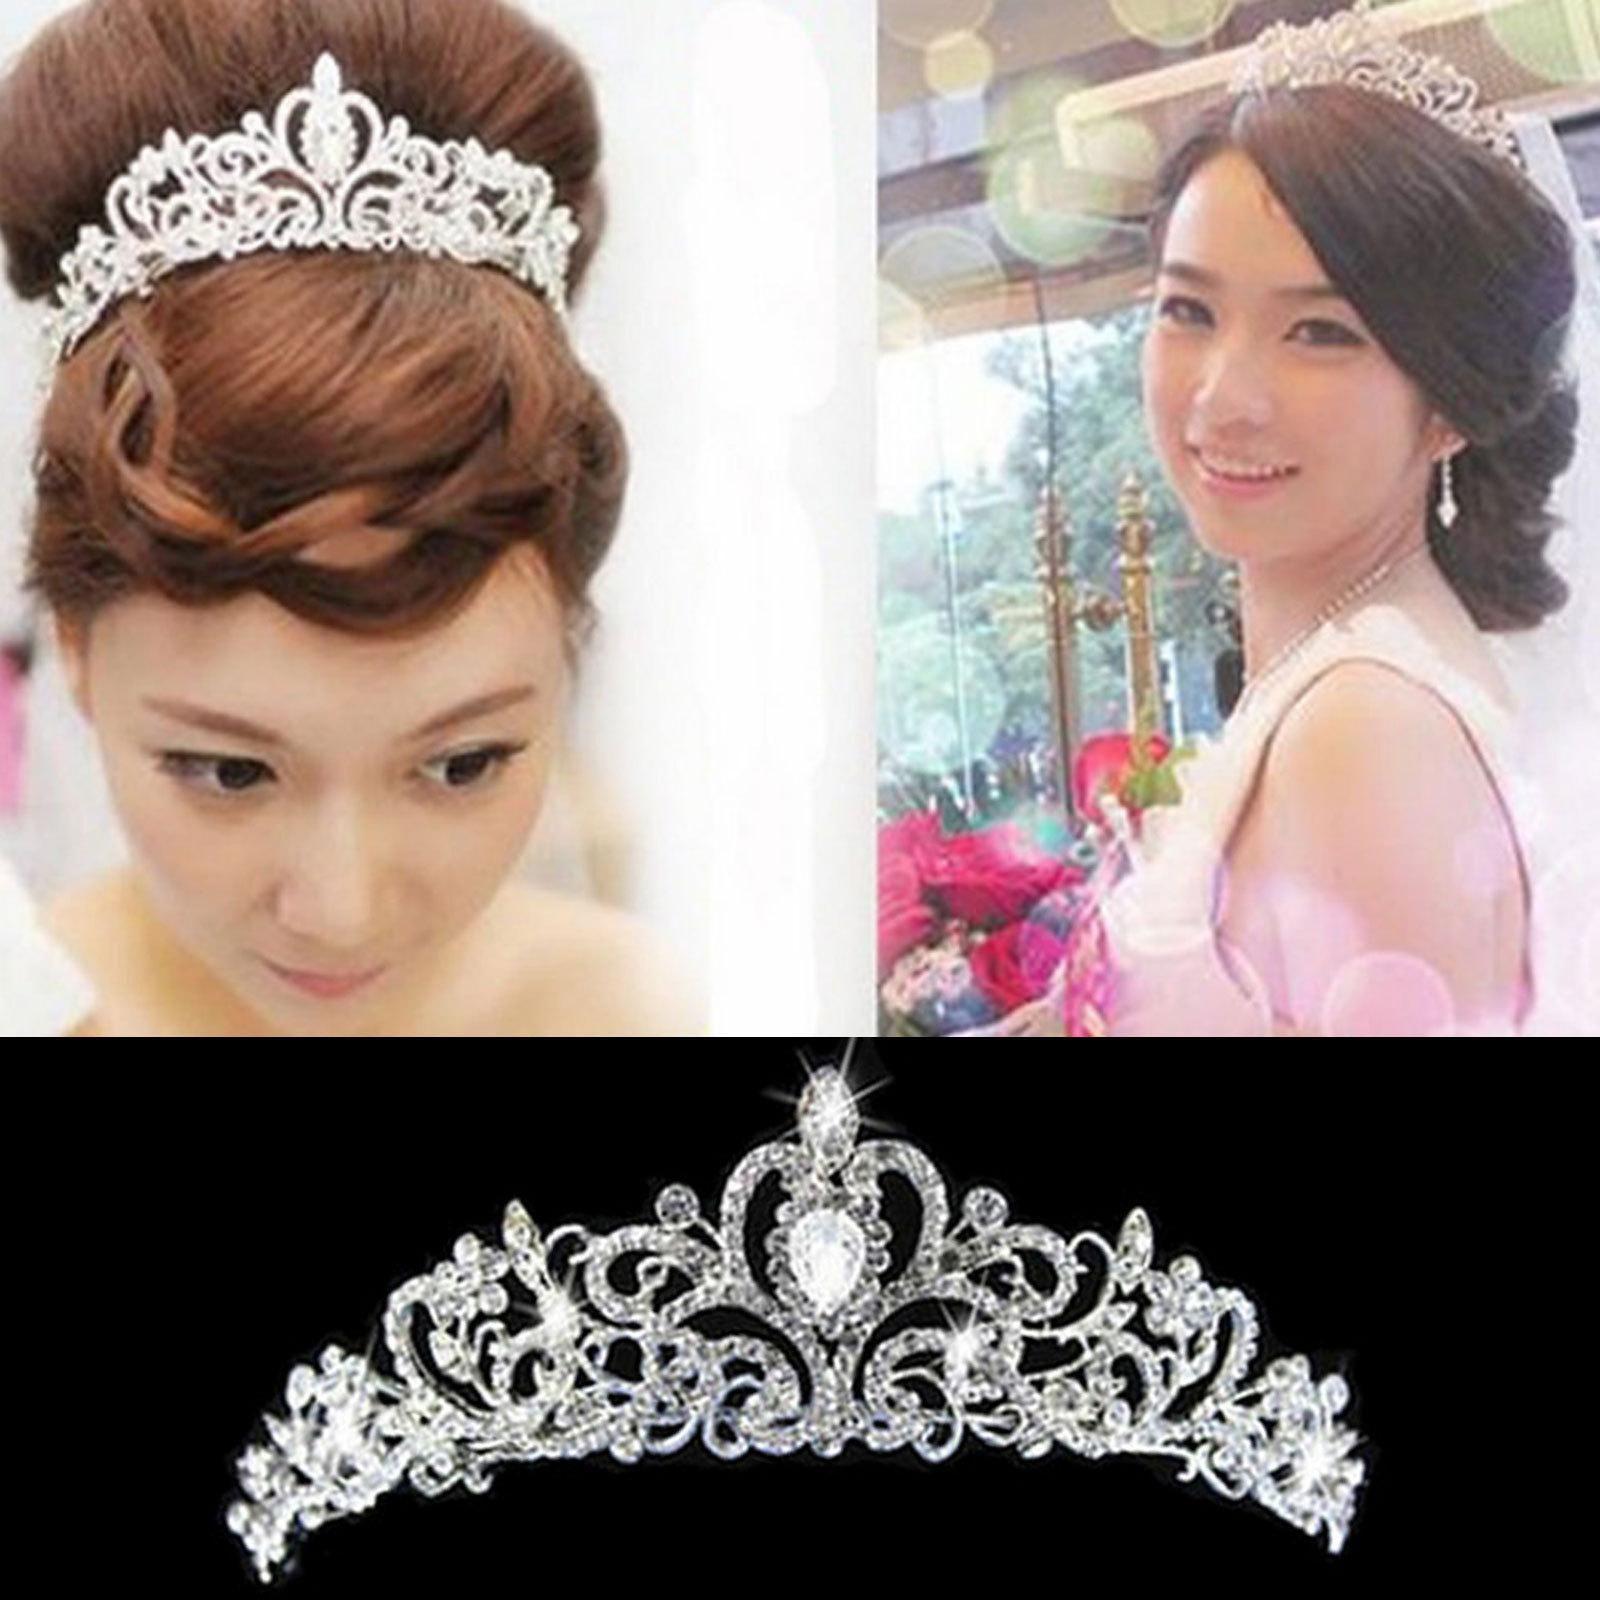 Wholesale Wedding Bridal - Buy WEDDING BRIDAL RHINESTONE CRYSTAL VICTORIAN CROWN TIARA HAIRBAND HEADBAND, $15.0 | DHgate